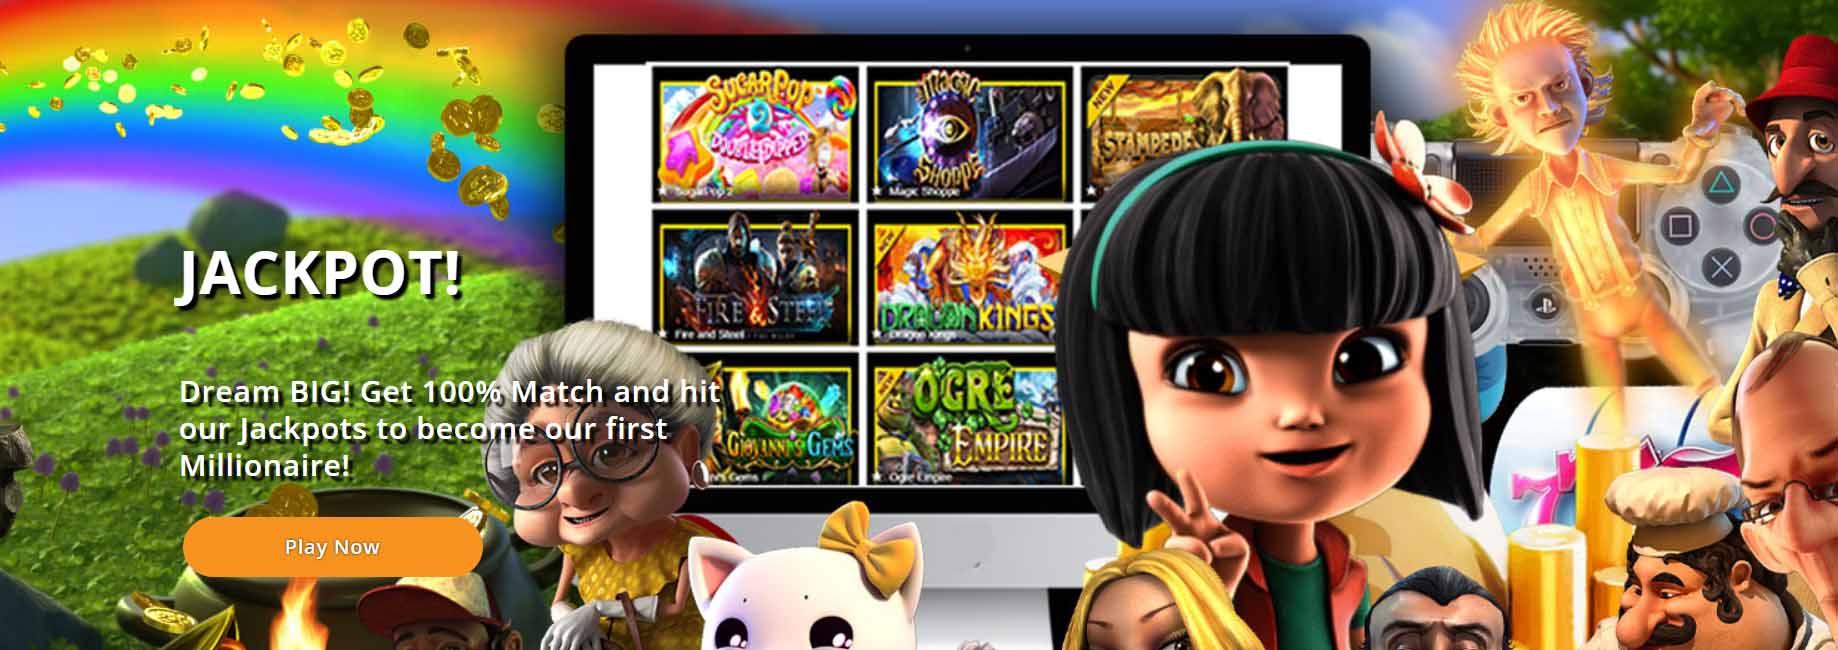 Casino765 Review jackpot